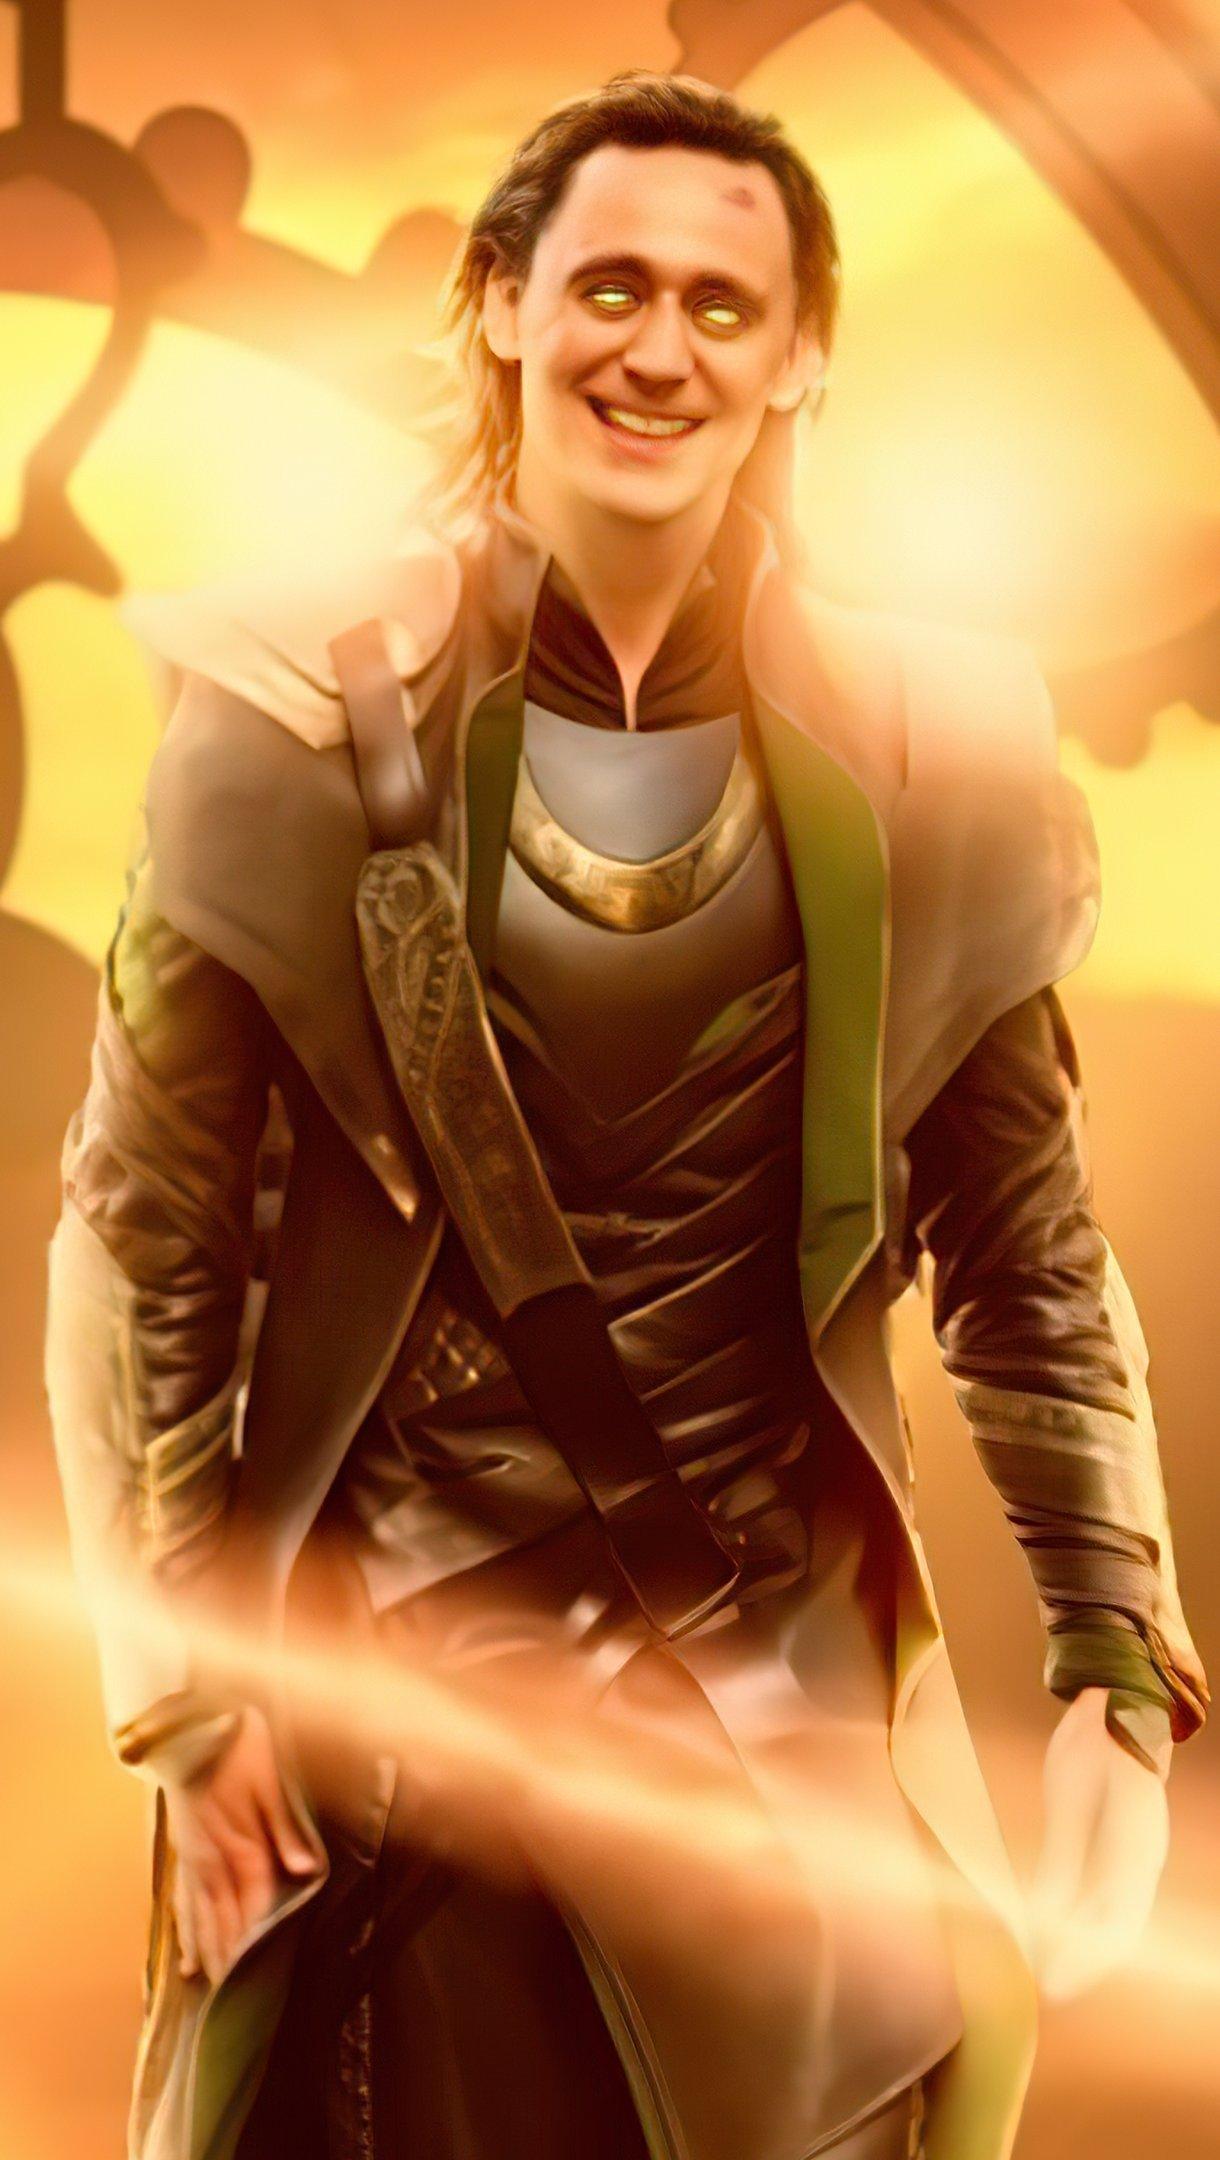 Wallpaper Loki The God of mischief Poster Vertical